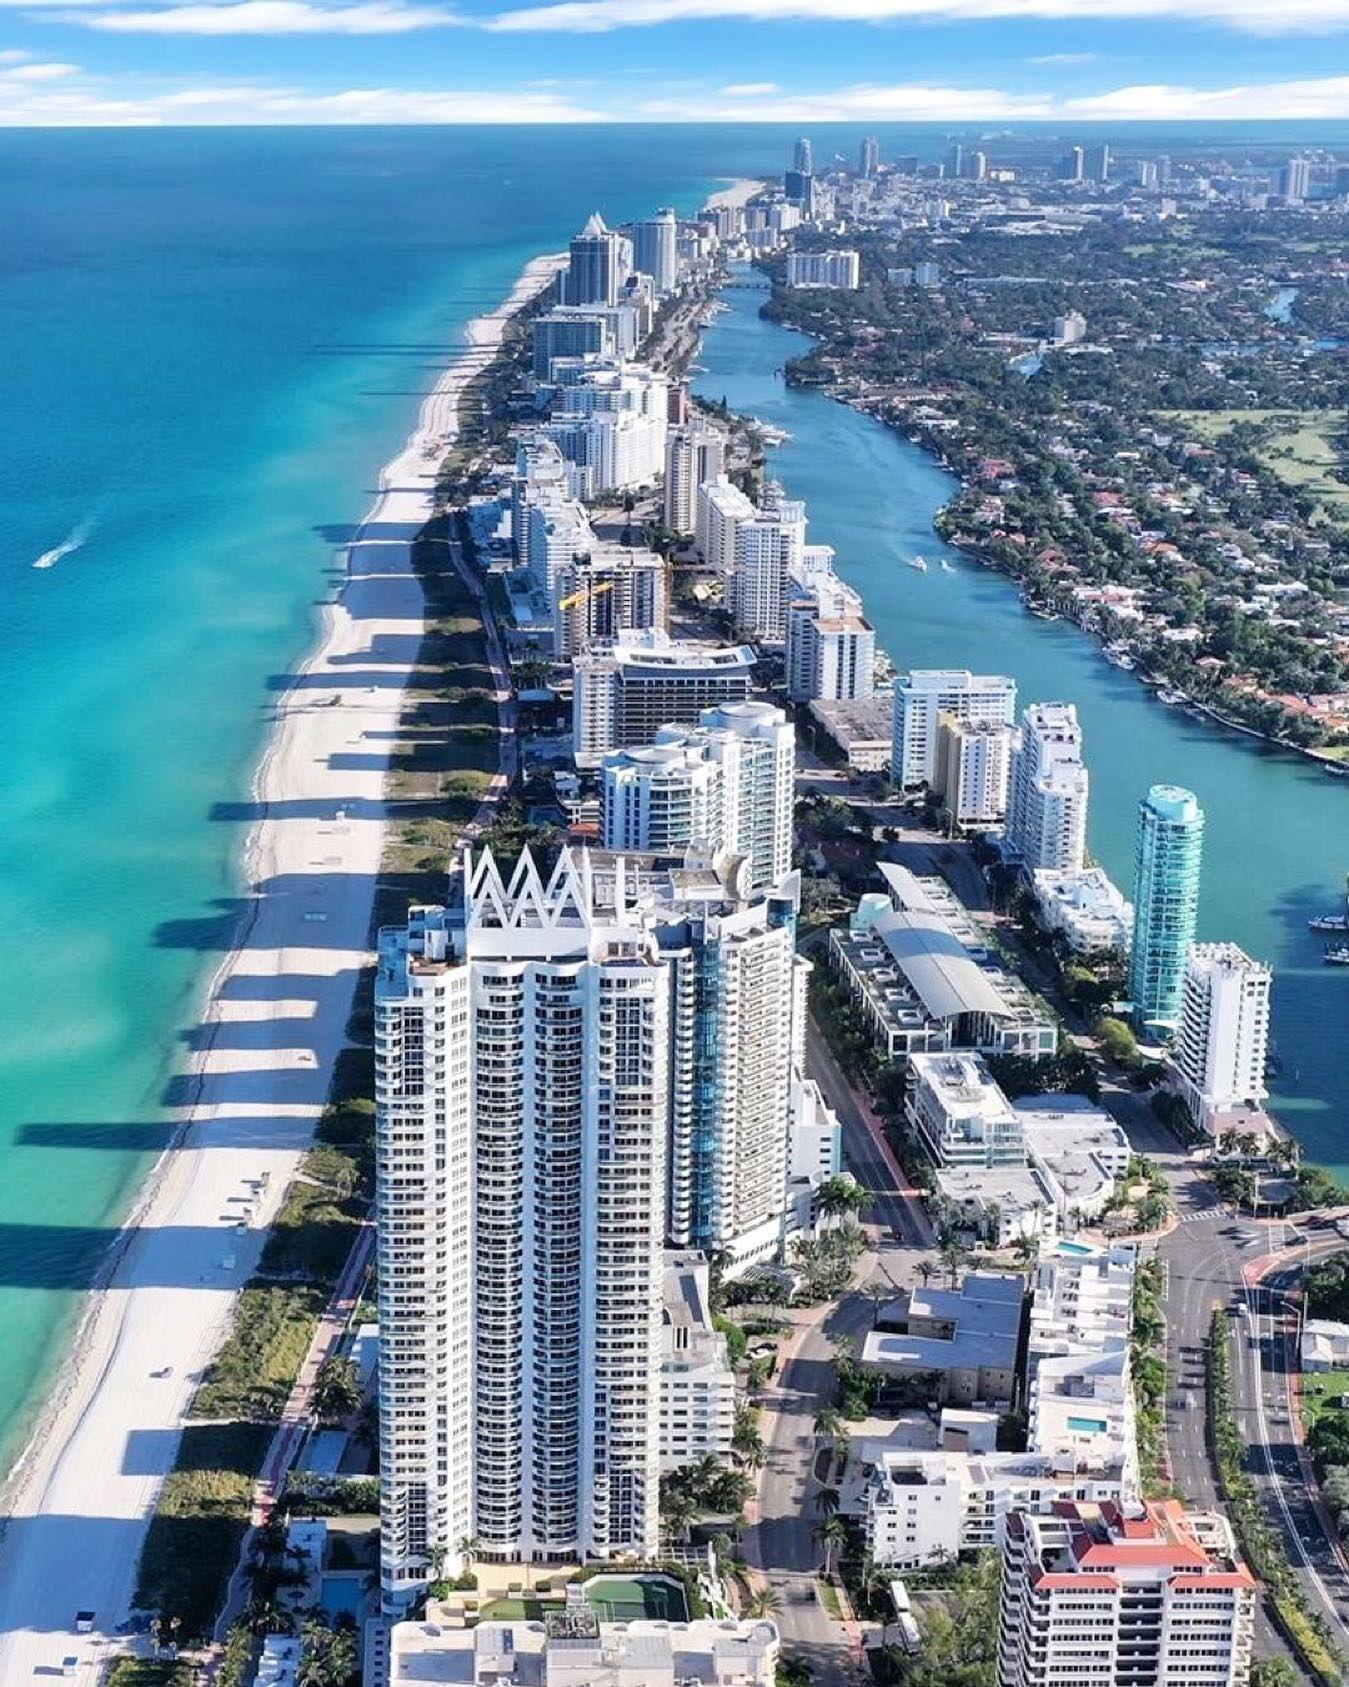 Life takes you down many paths but my favorite ones lead to Miami Beach  Tag someone who needs this   @creativedigibox #miamibeachlife #miamiliving #miamibeach